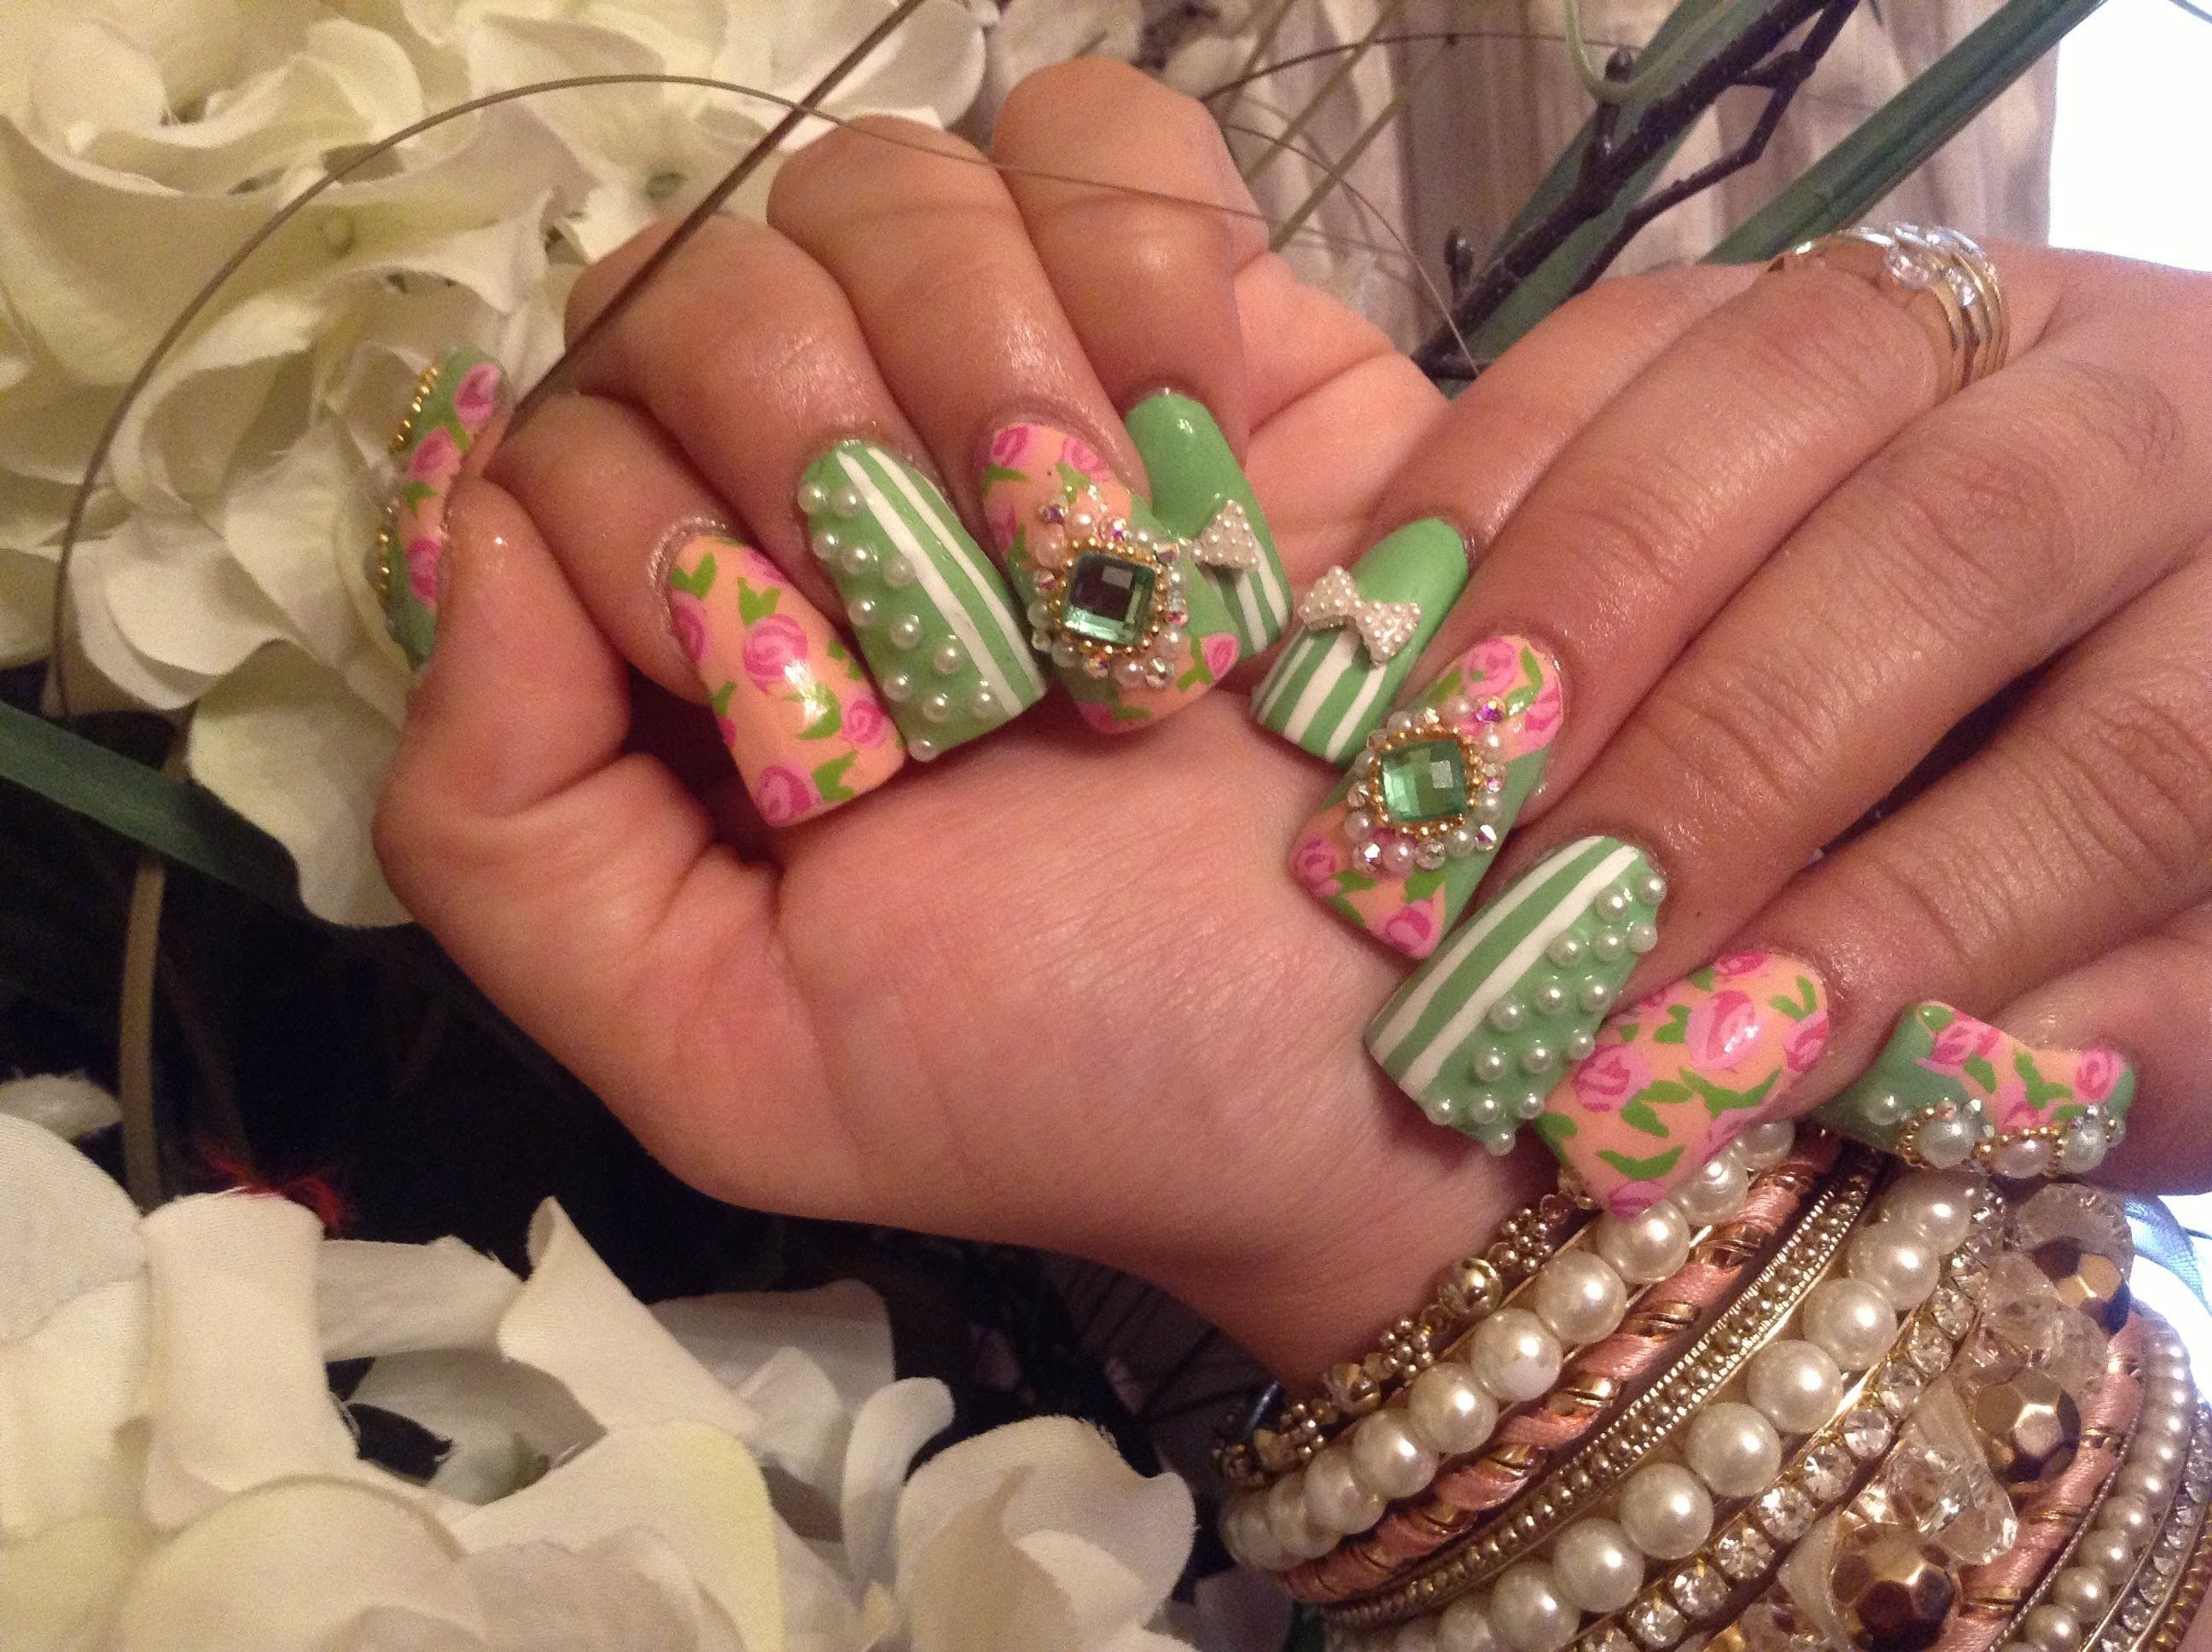 Uñas Acrilicas: Diseño Vintage -Estilo Sinaloa | Nails | Pinterest ...